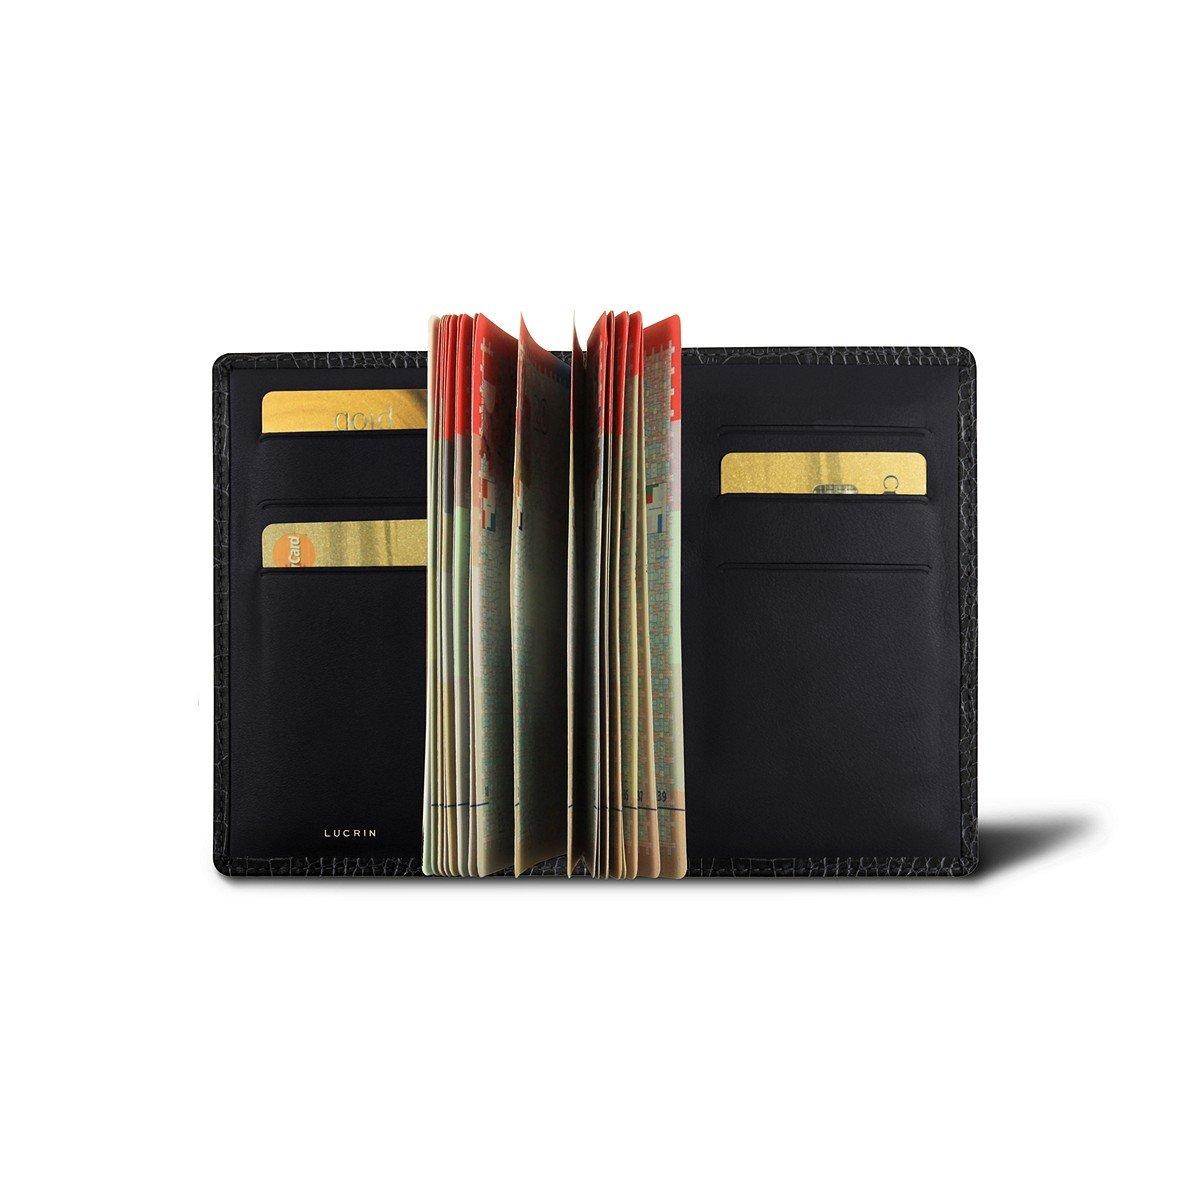 Lucrin - Luxury Passport Holder - Black - Crocodile style calfskin